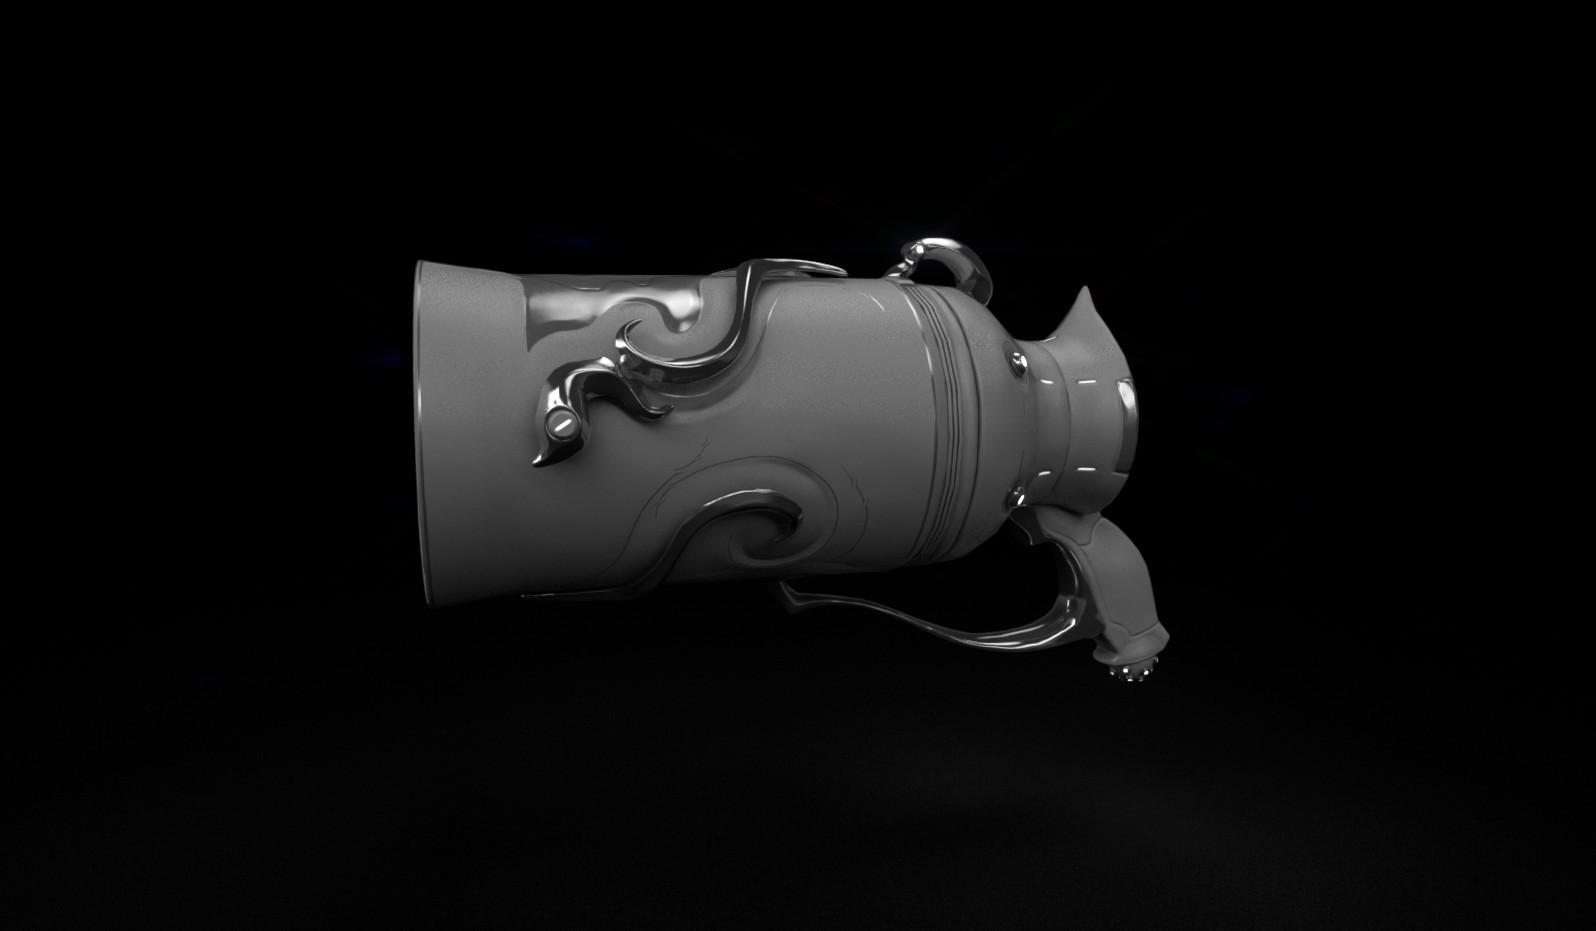 Duncan ecclestone cannoneer 021